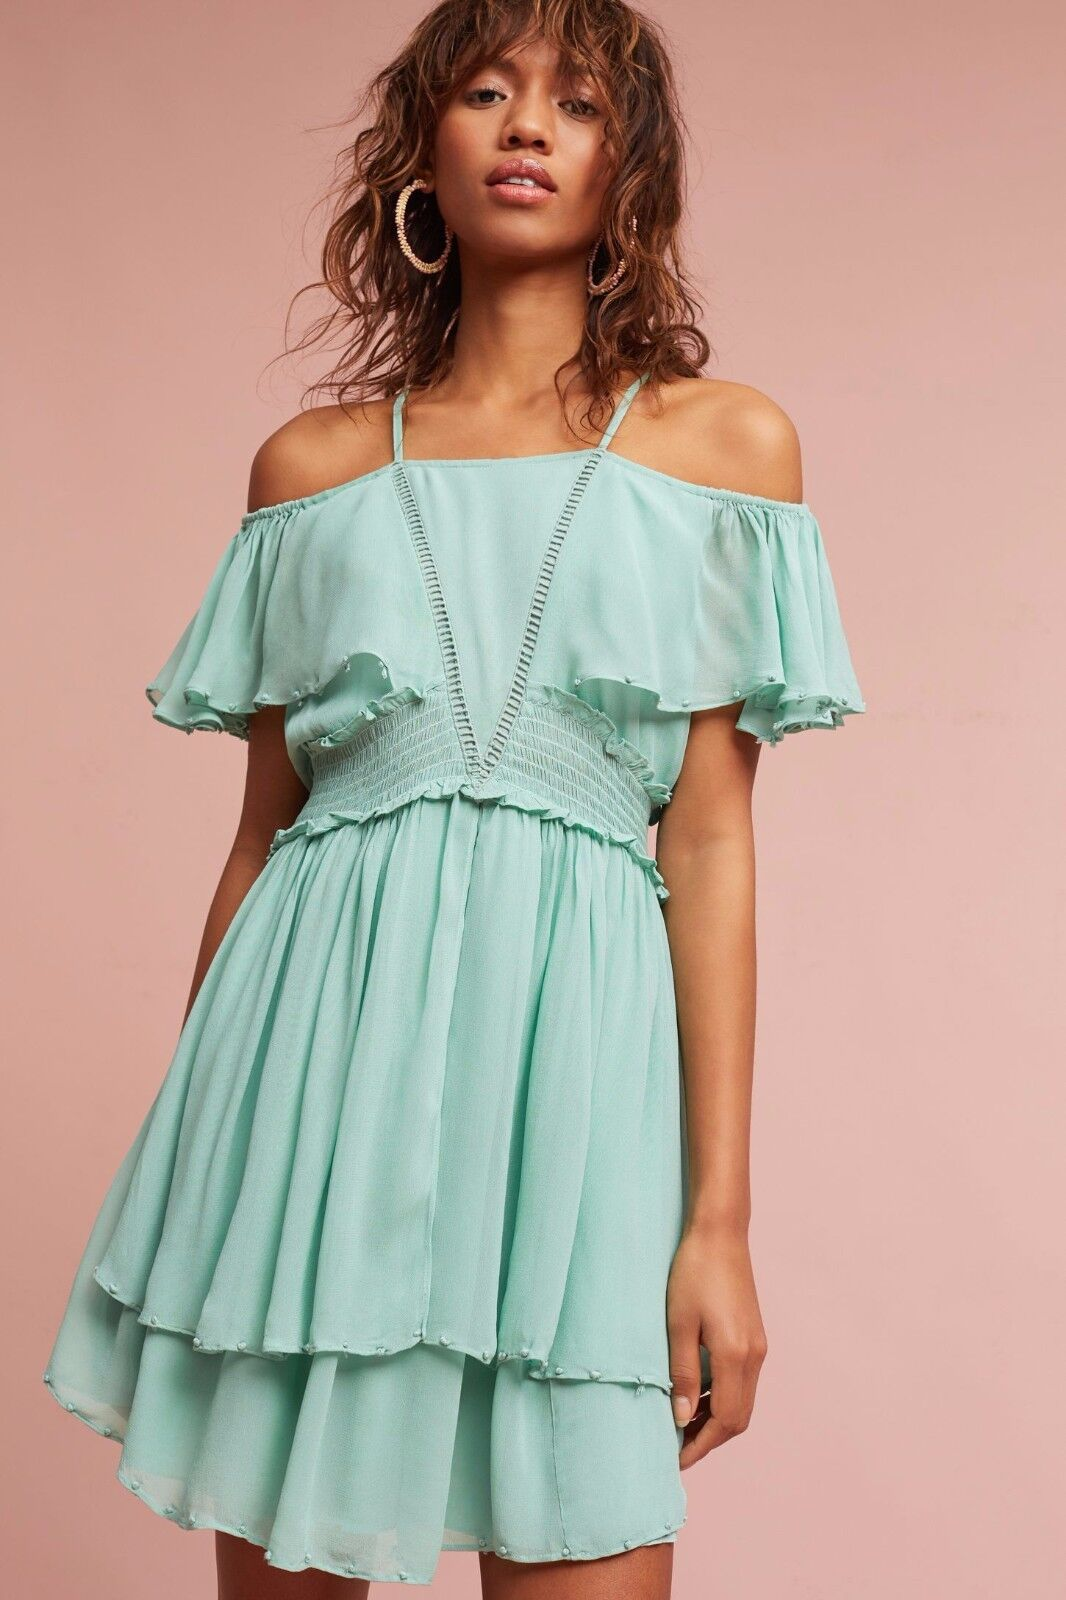 NWT SZ XL Elisa Ruffled Open-Shoulder Open-Shoulder Open-Shoulder Dress By Maeve Mint f7758a